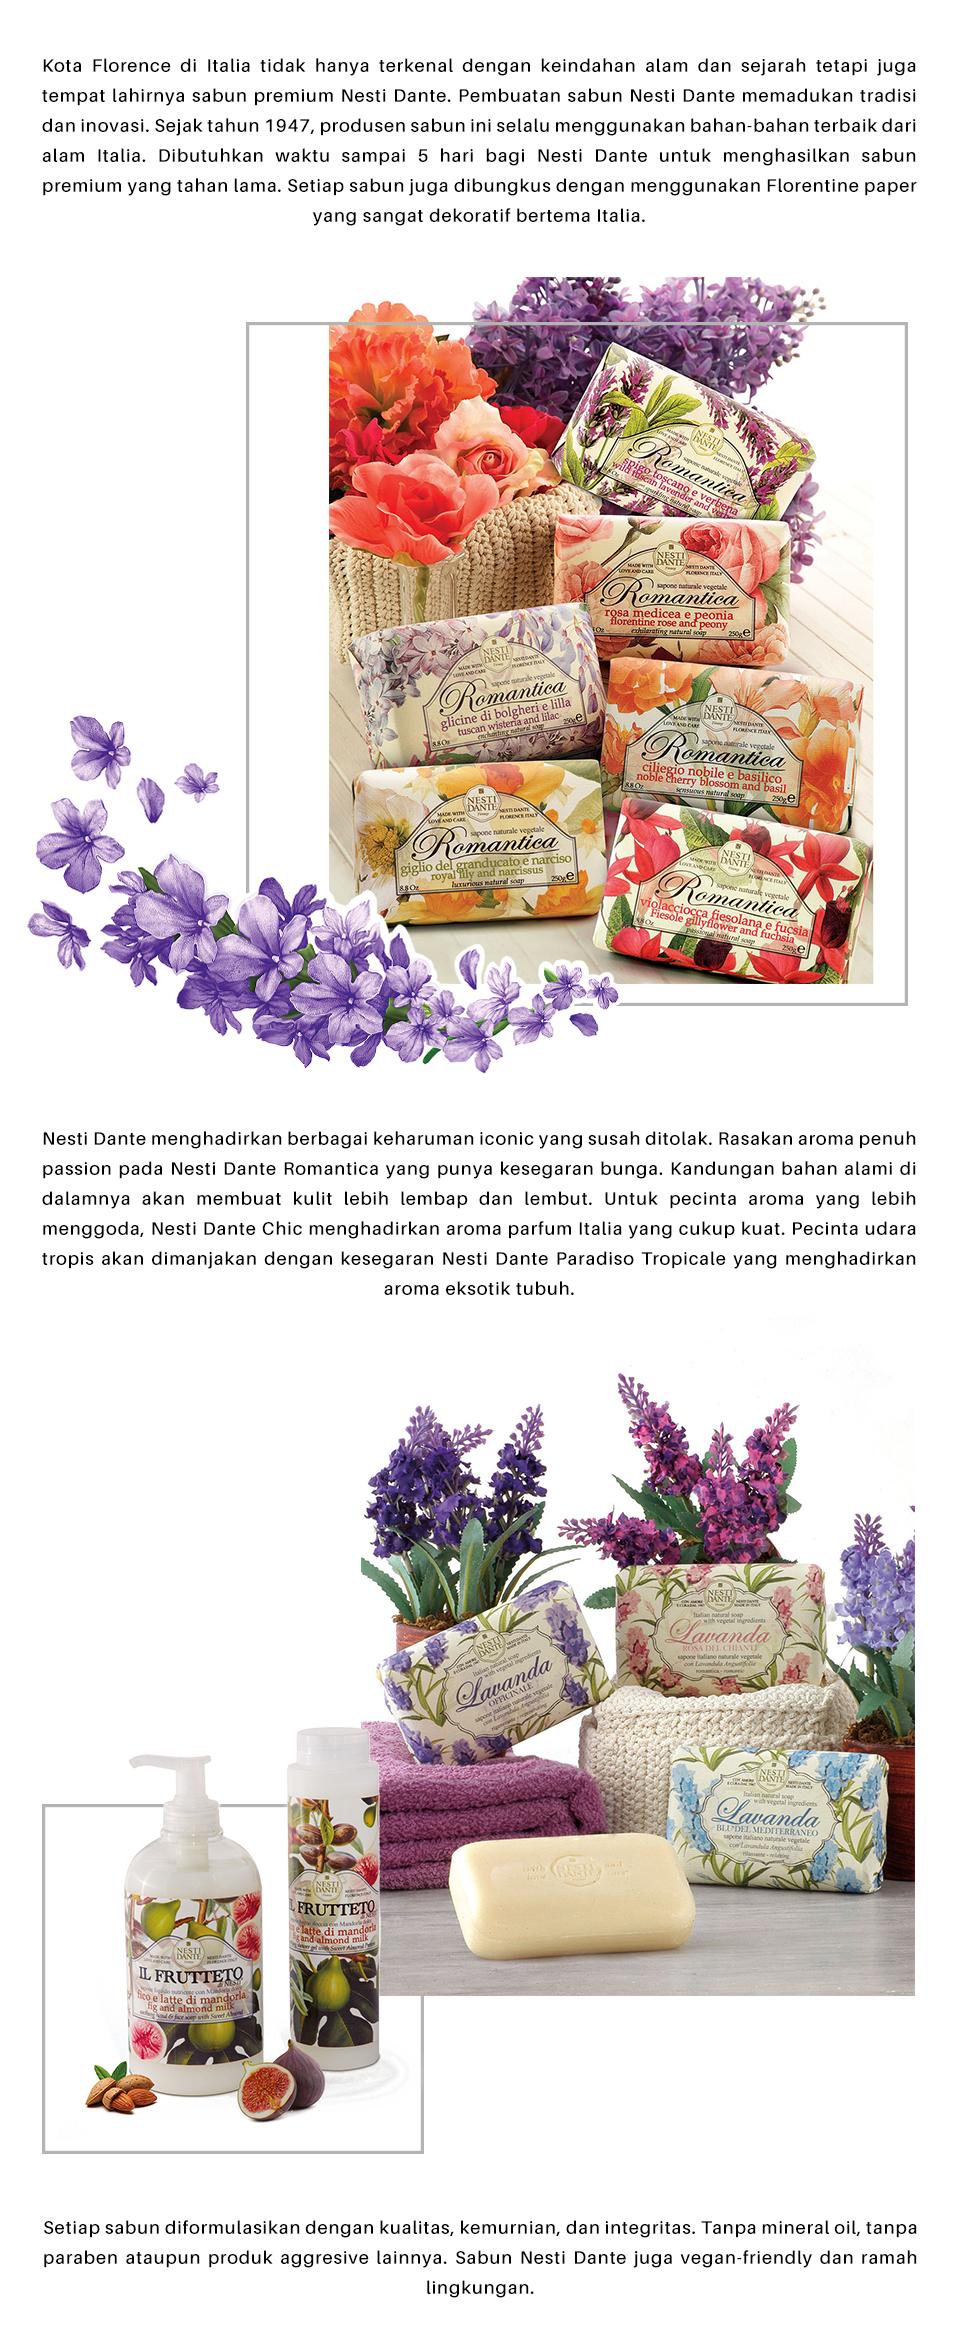 Ilotte Theme Shop Keharuman Sabun Premium Nesti Dante Rose Herbal 04 12 2017